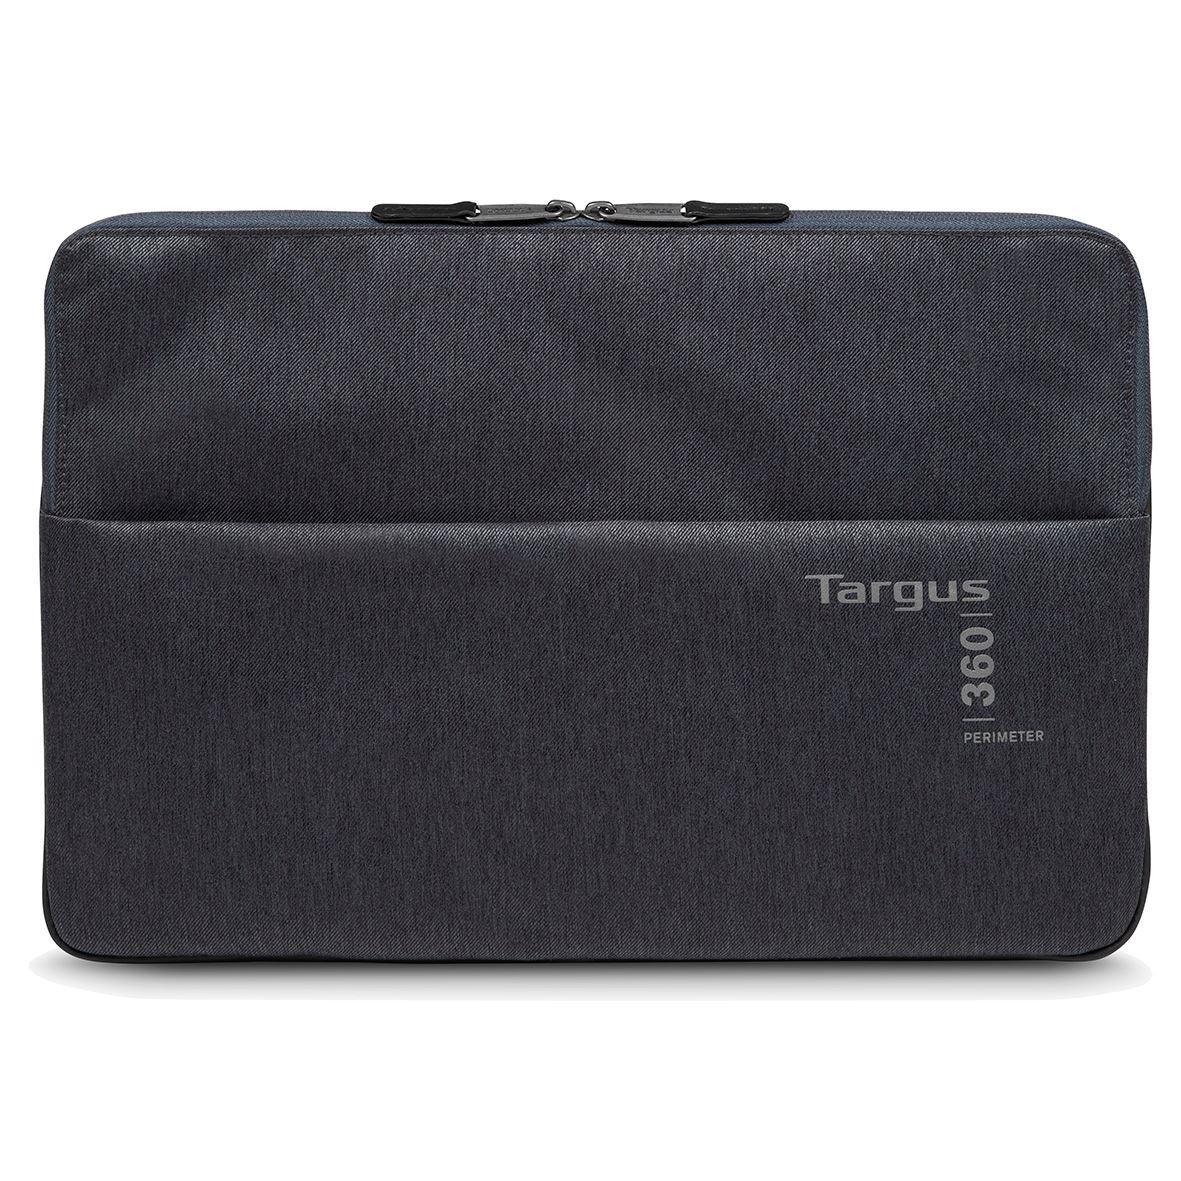 Husa Notebook Targus 360 Perimeter 15.6 Gri title=Husa Notebook Targus 360 Perimeter 15.6 Gri